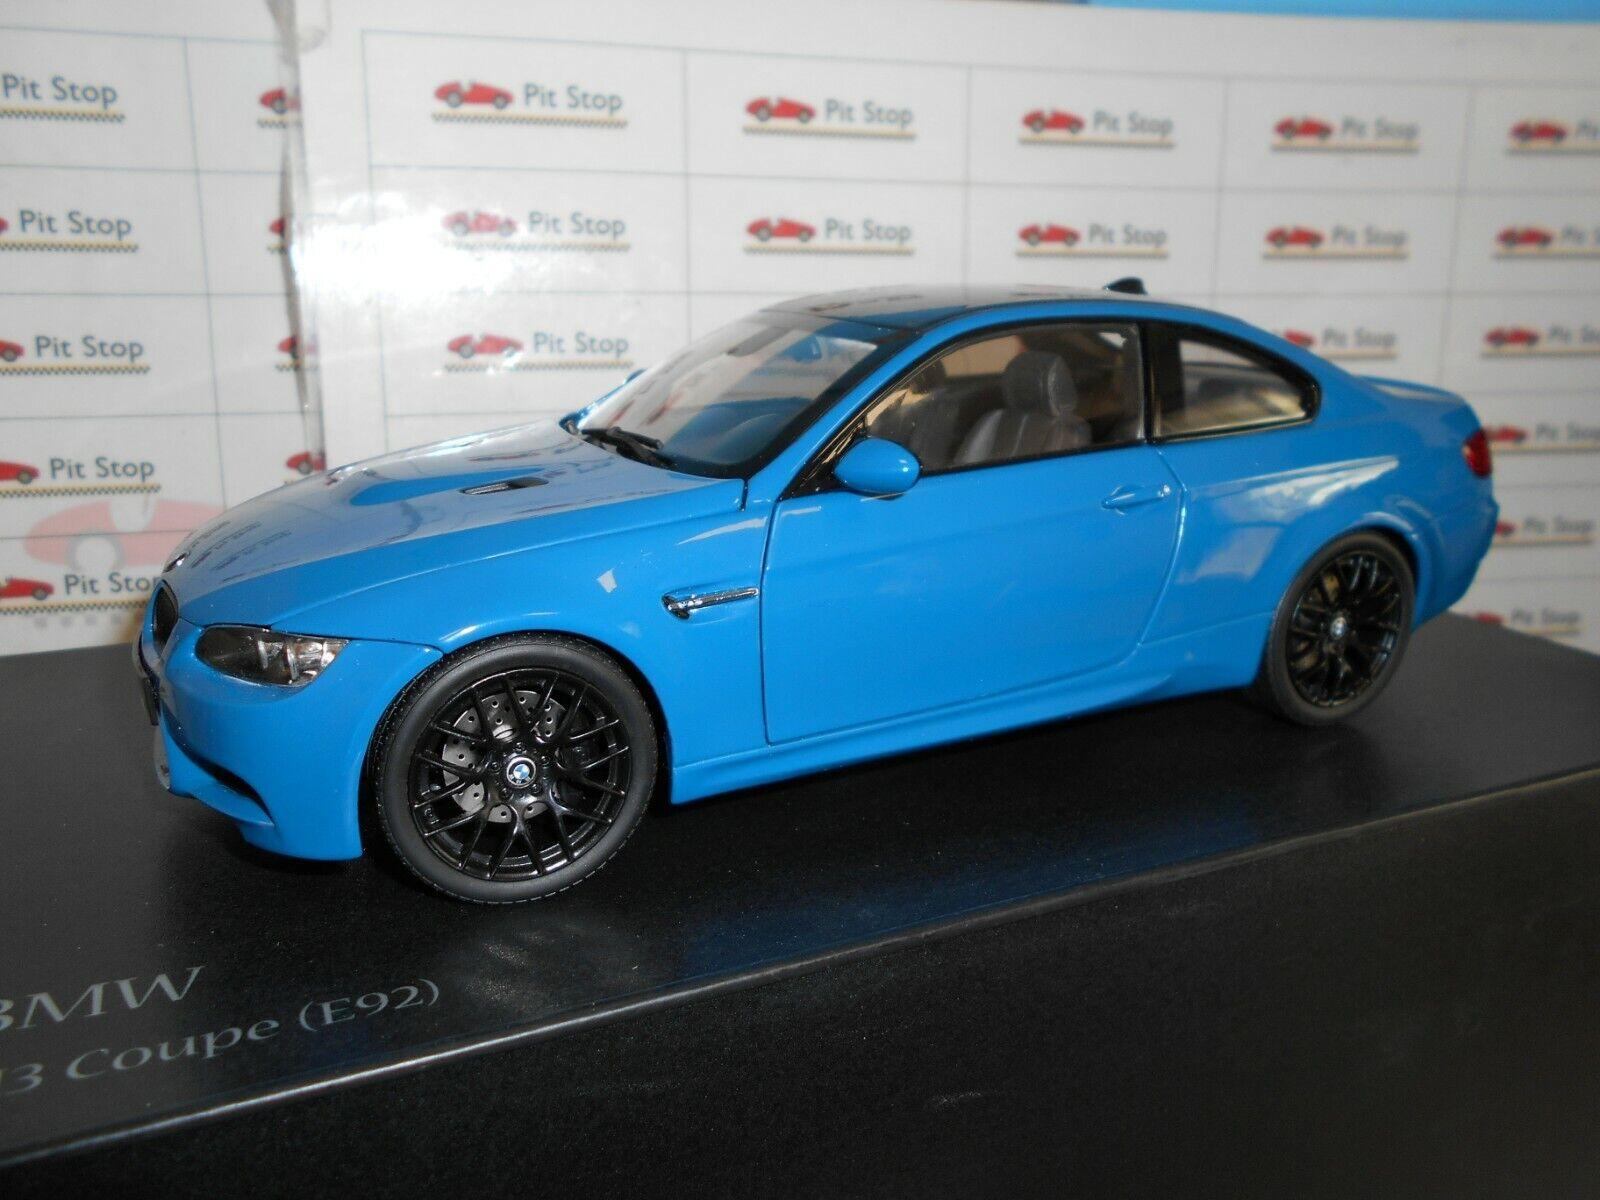 KYO08734LBL by KYOSHO BMW M3 COUPE E92 blueE LAGUNA SECA 1 18